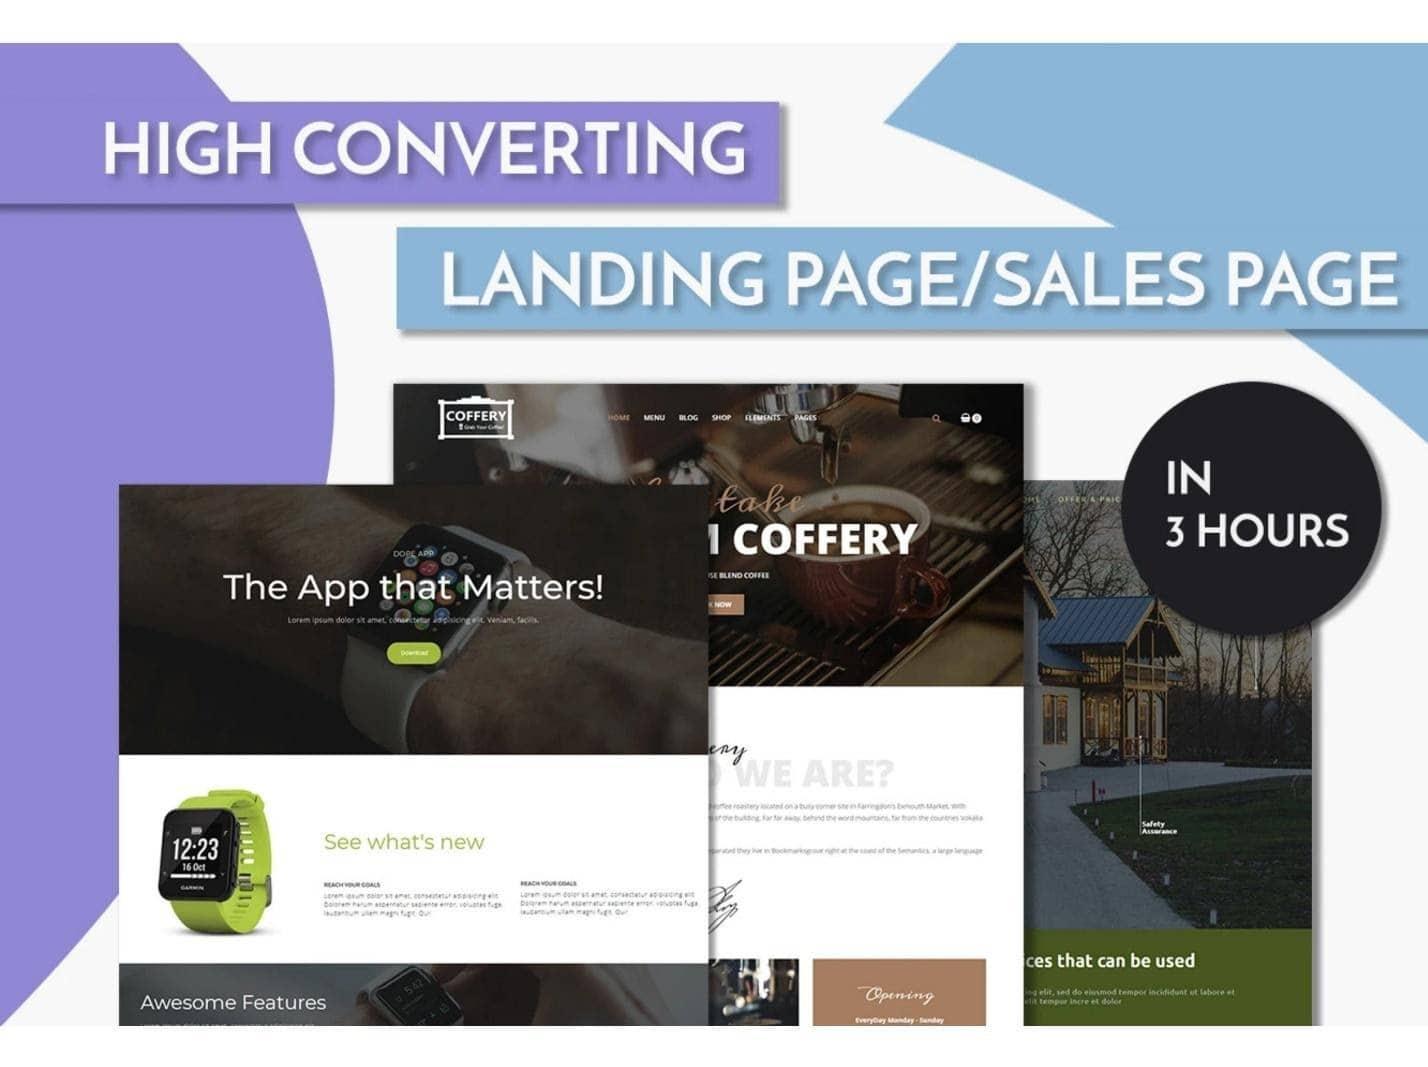 fiverr-freelancer-tiyam-foyraz-landing-page-design